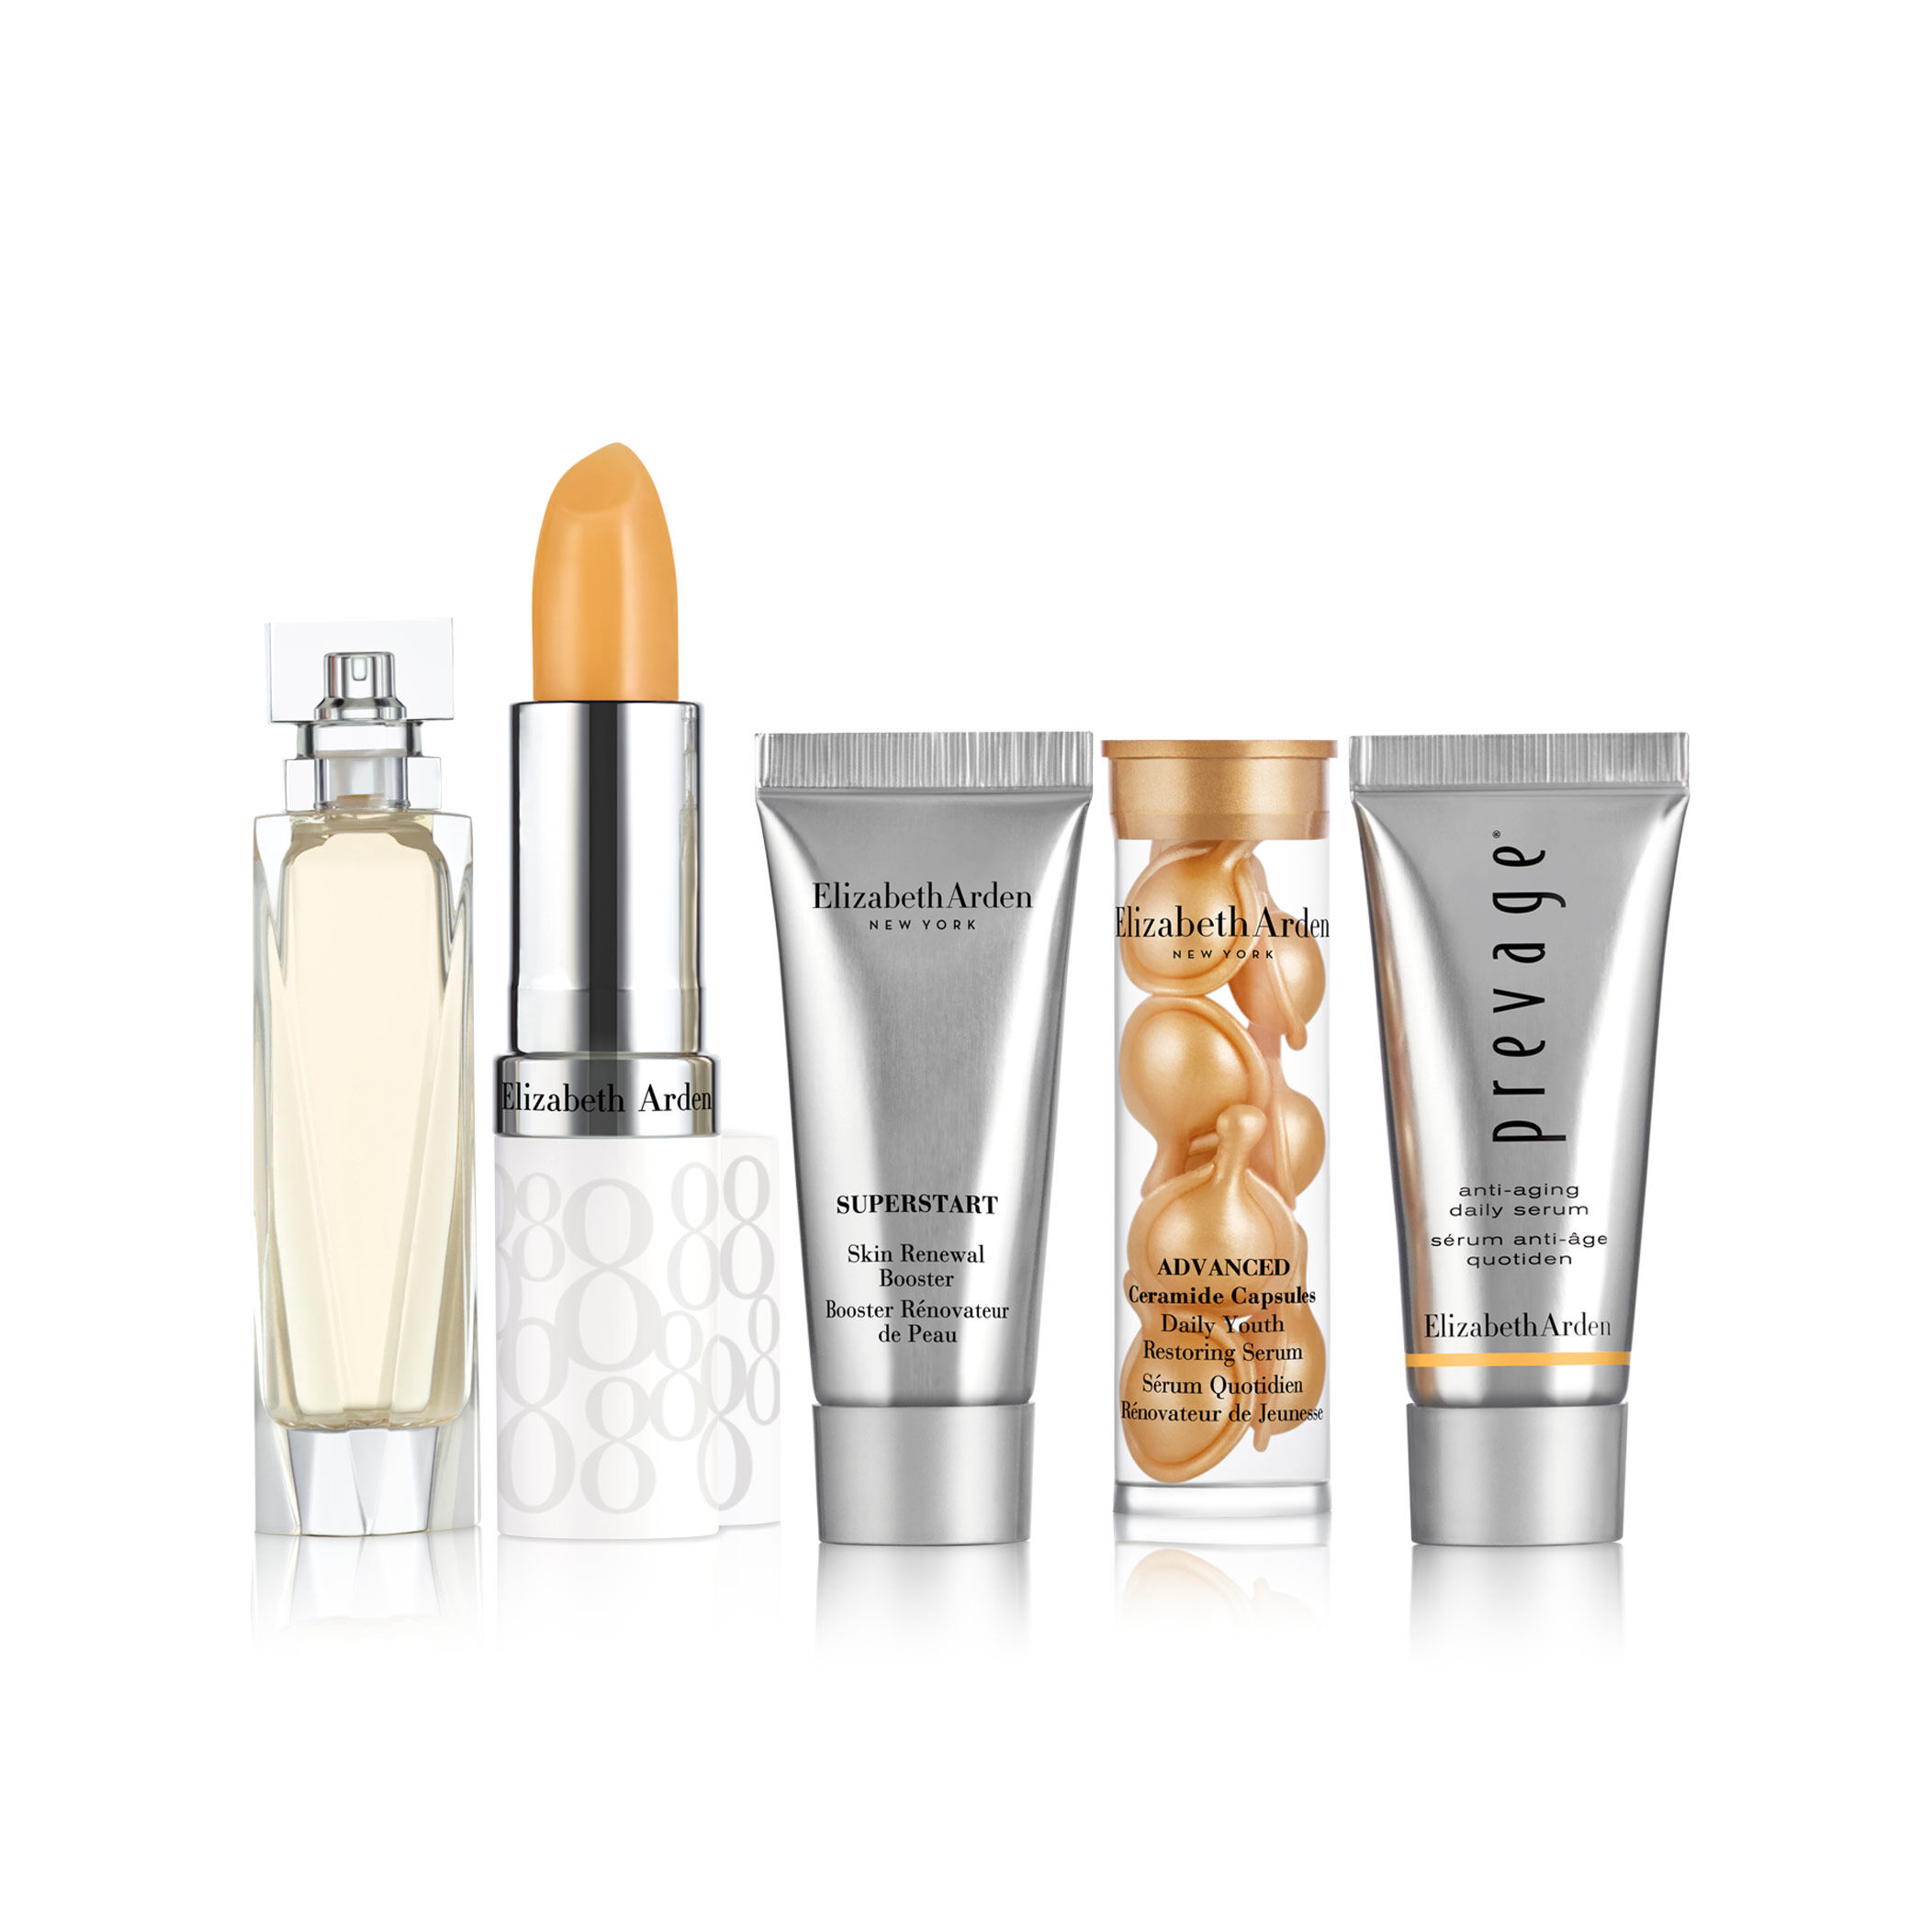 Elizabeth Arden Perfume Only Nyc